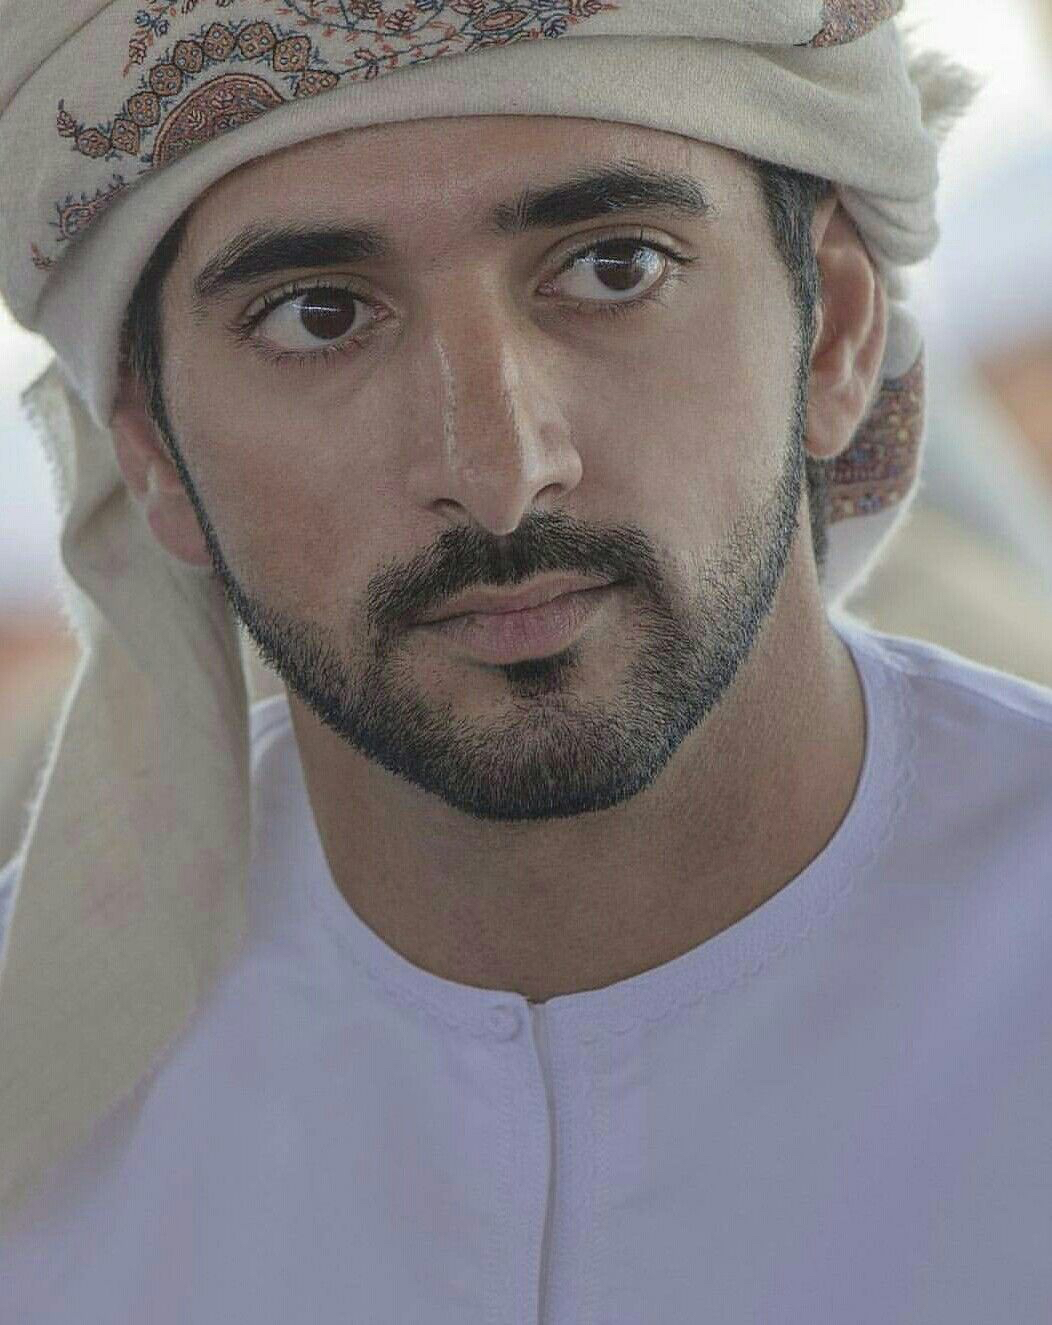 Sheikh Hamdan Wife Photos : sheikh, hamdan, photos, Fazza, Takes, Instagram, Reinforce, Important, Message, Savoir, Flair